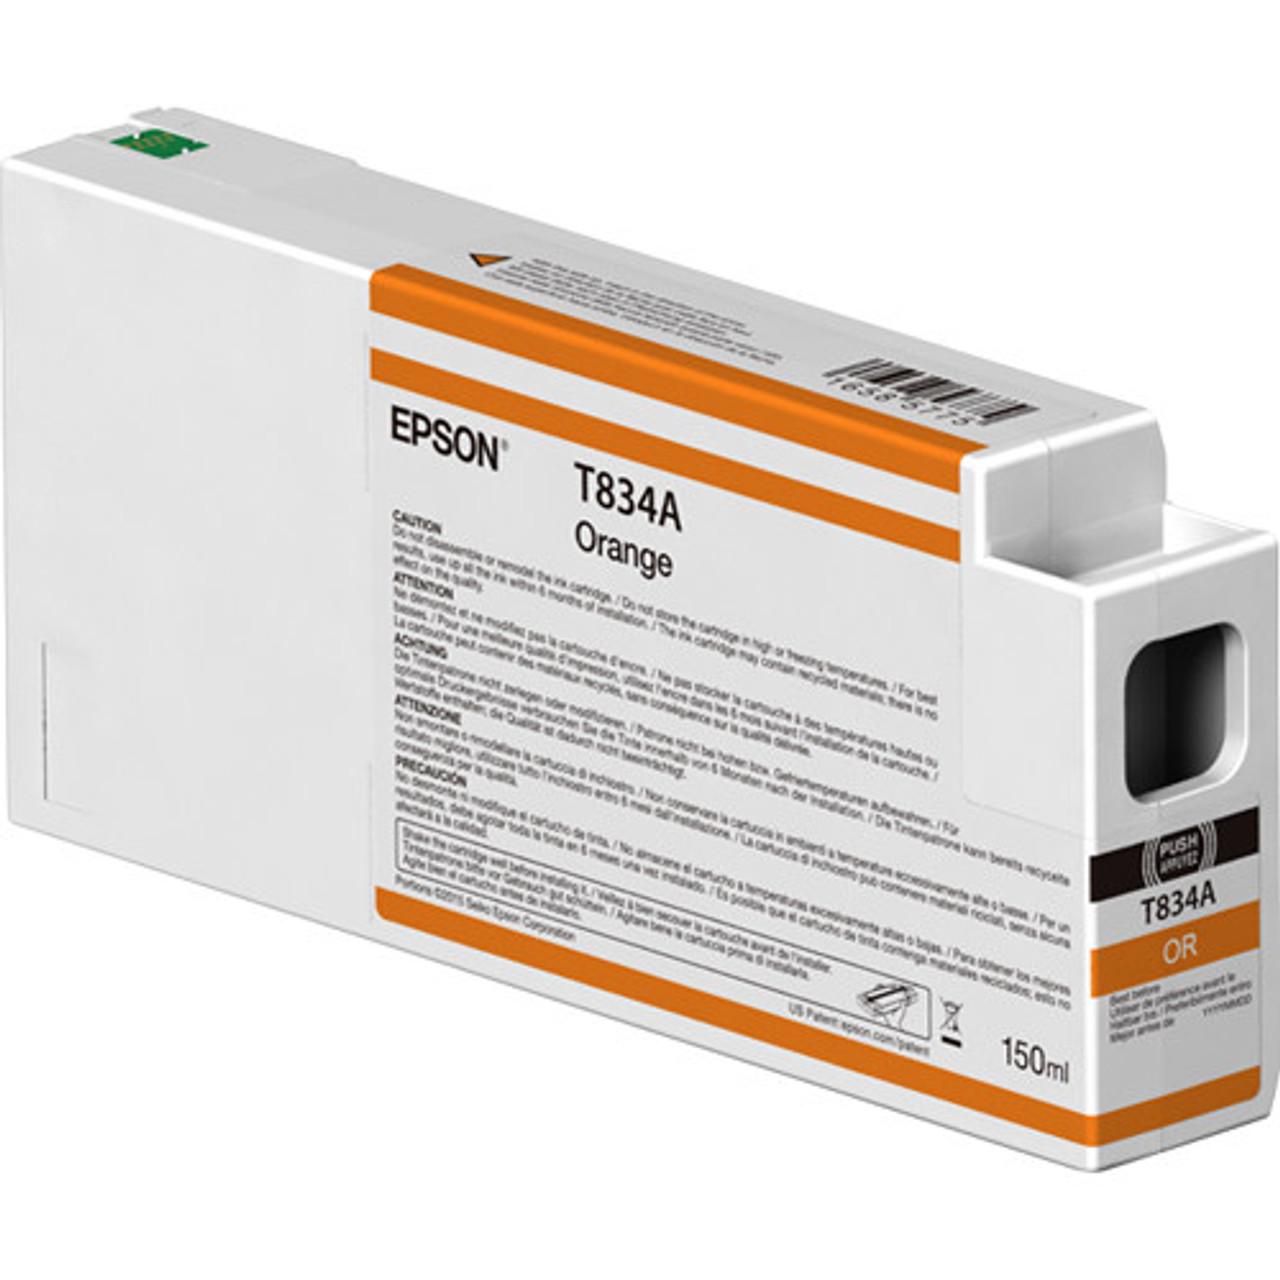 Epson T834A00 Orange Ink Cartridge, 150 mL